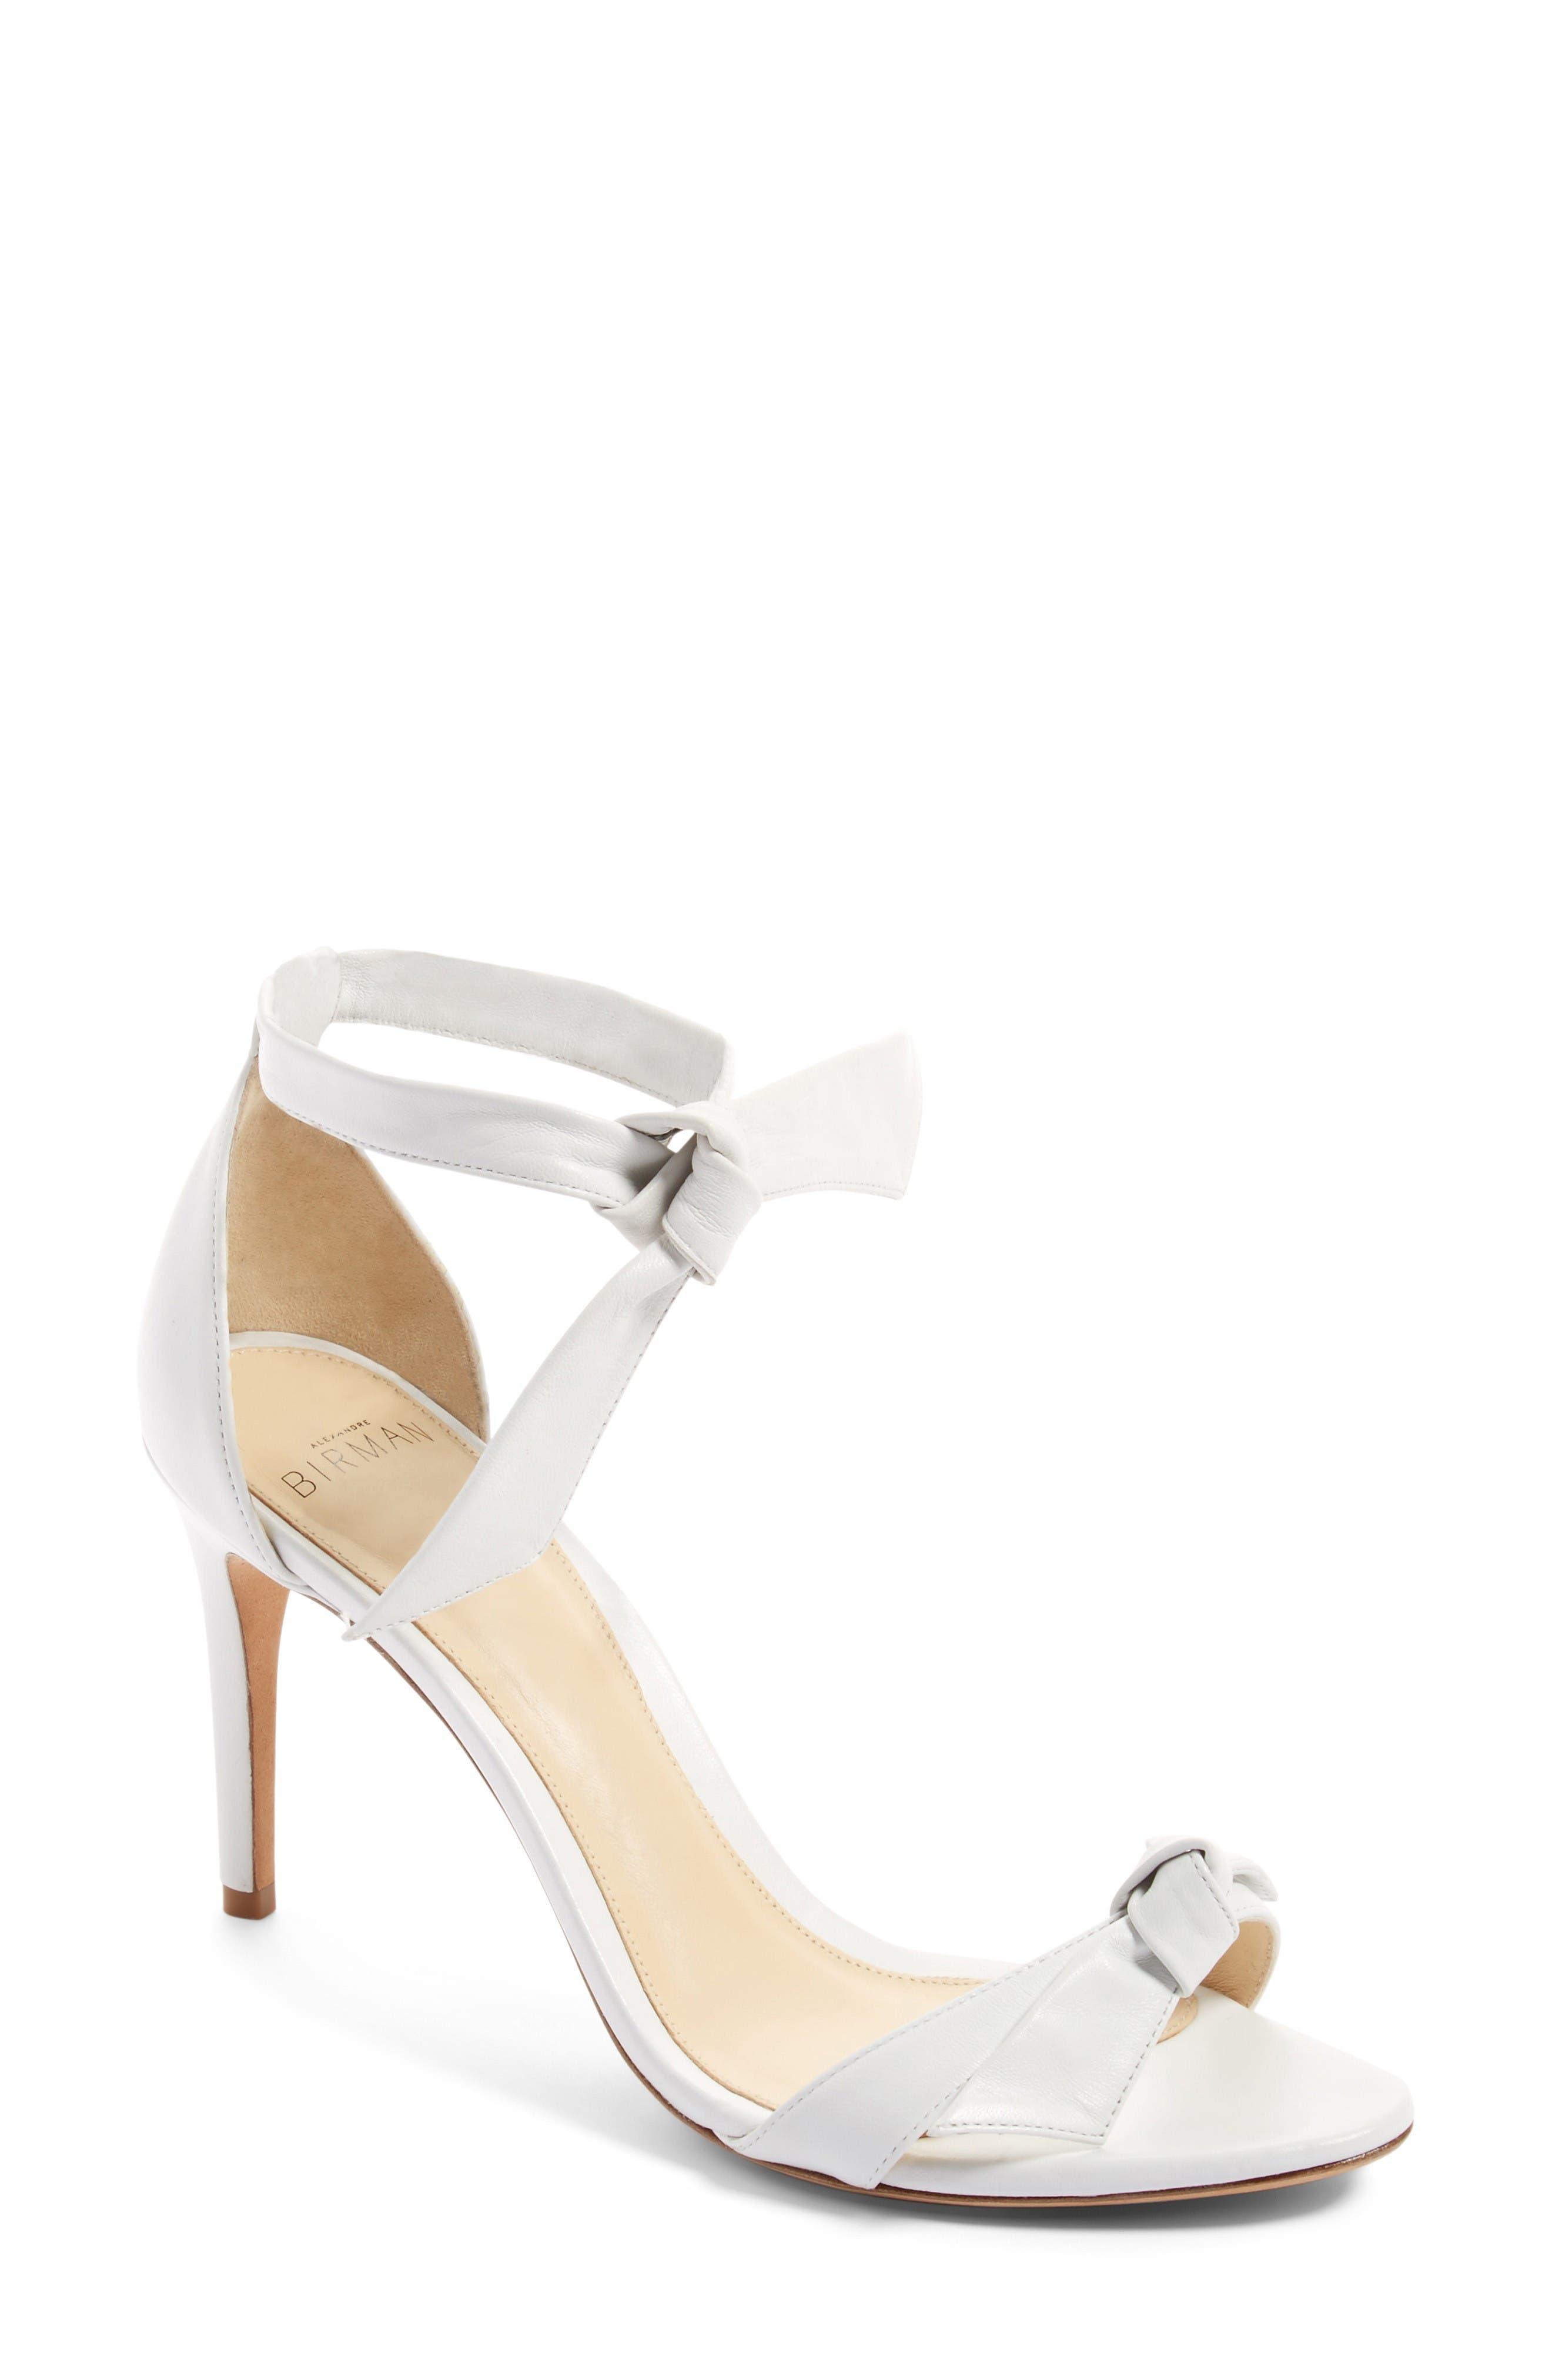 Clarita Ankle Tie Sandal,                             Main thumbnail 1, color,                             White Leather